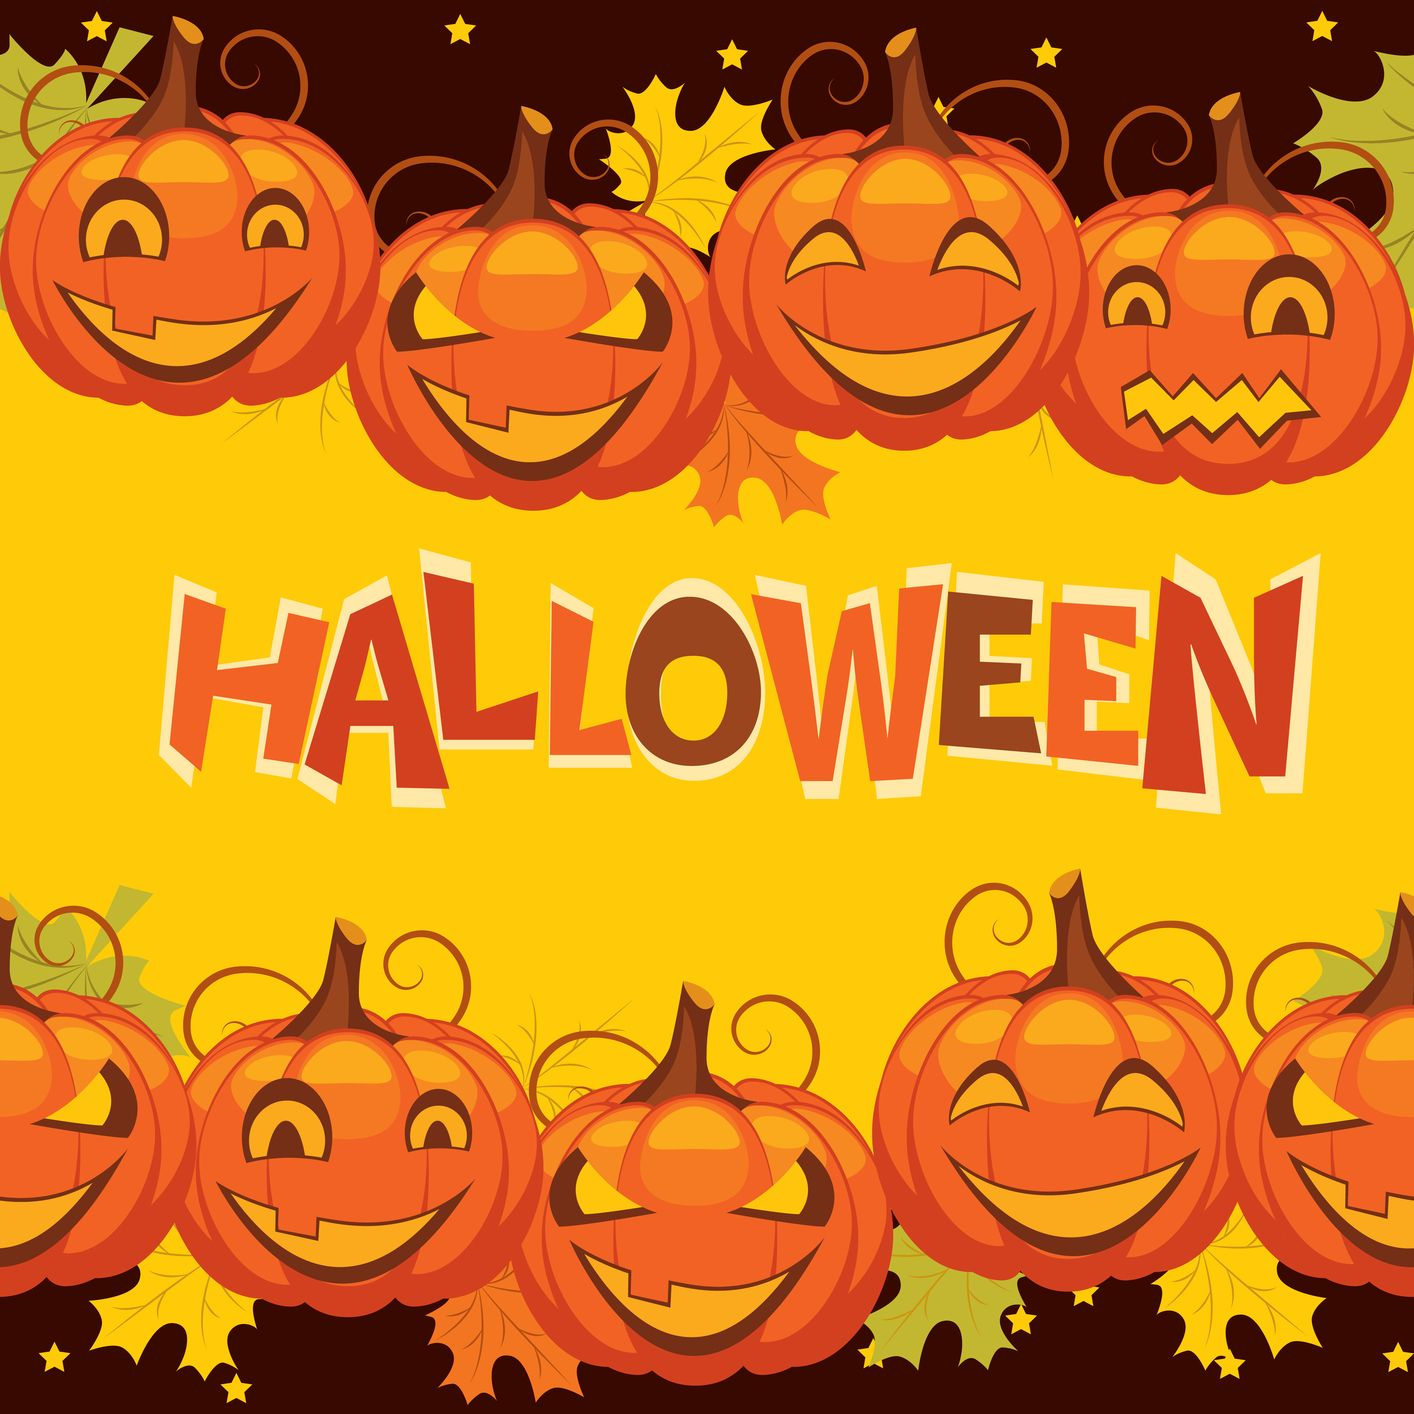 Free Halloween Computer Wallpaper Backgrounds